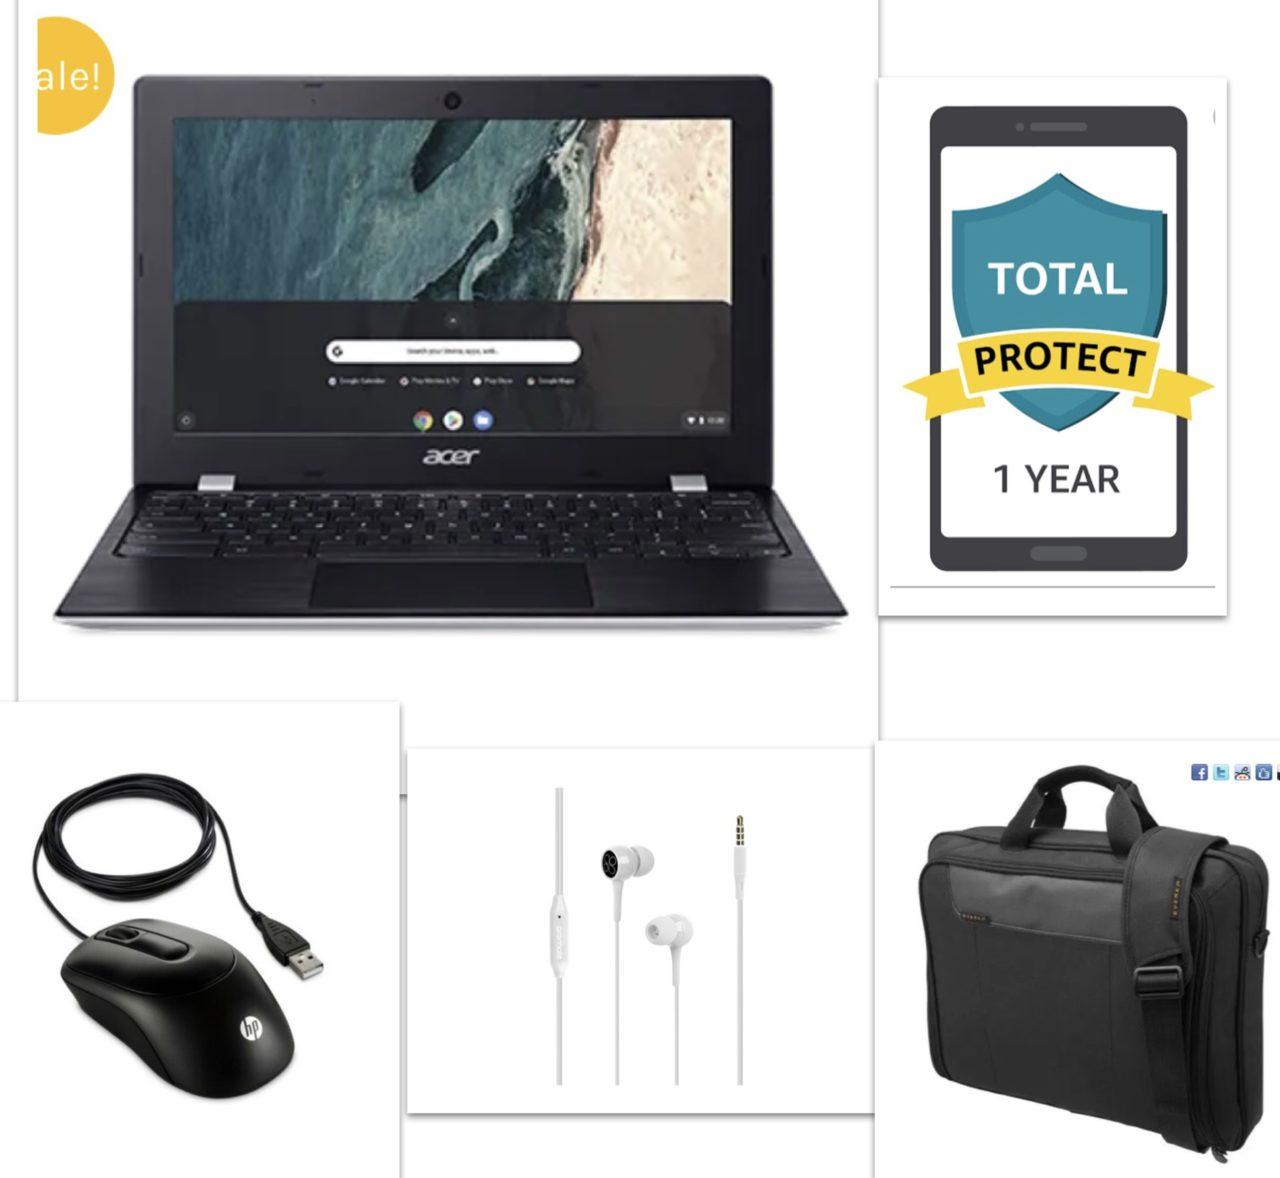 New Acer 11.6 Chromebook Bundle – Chromebook+Bag+Ear Phone+Mouse+12 Month Damage Protection